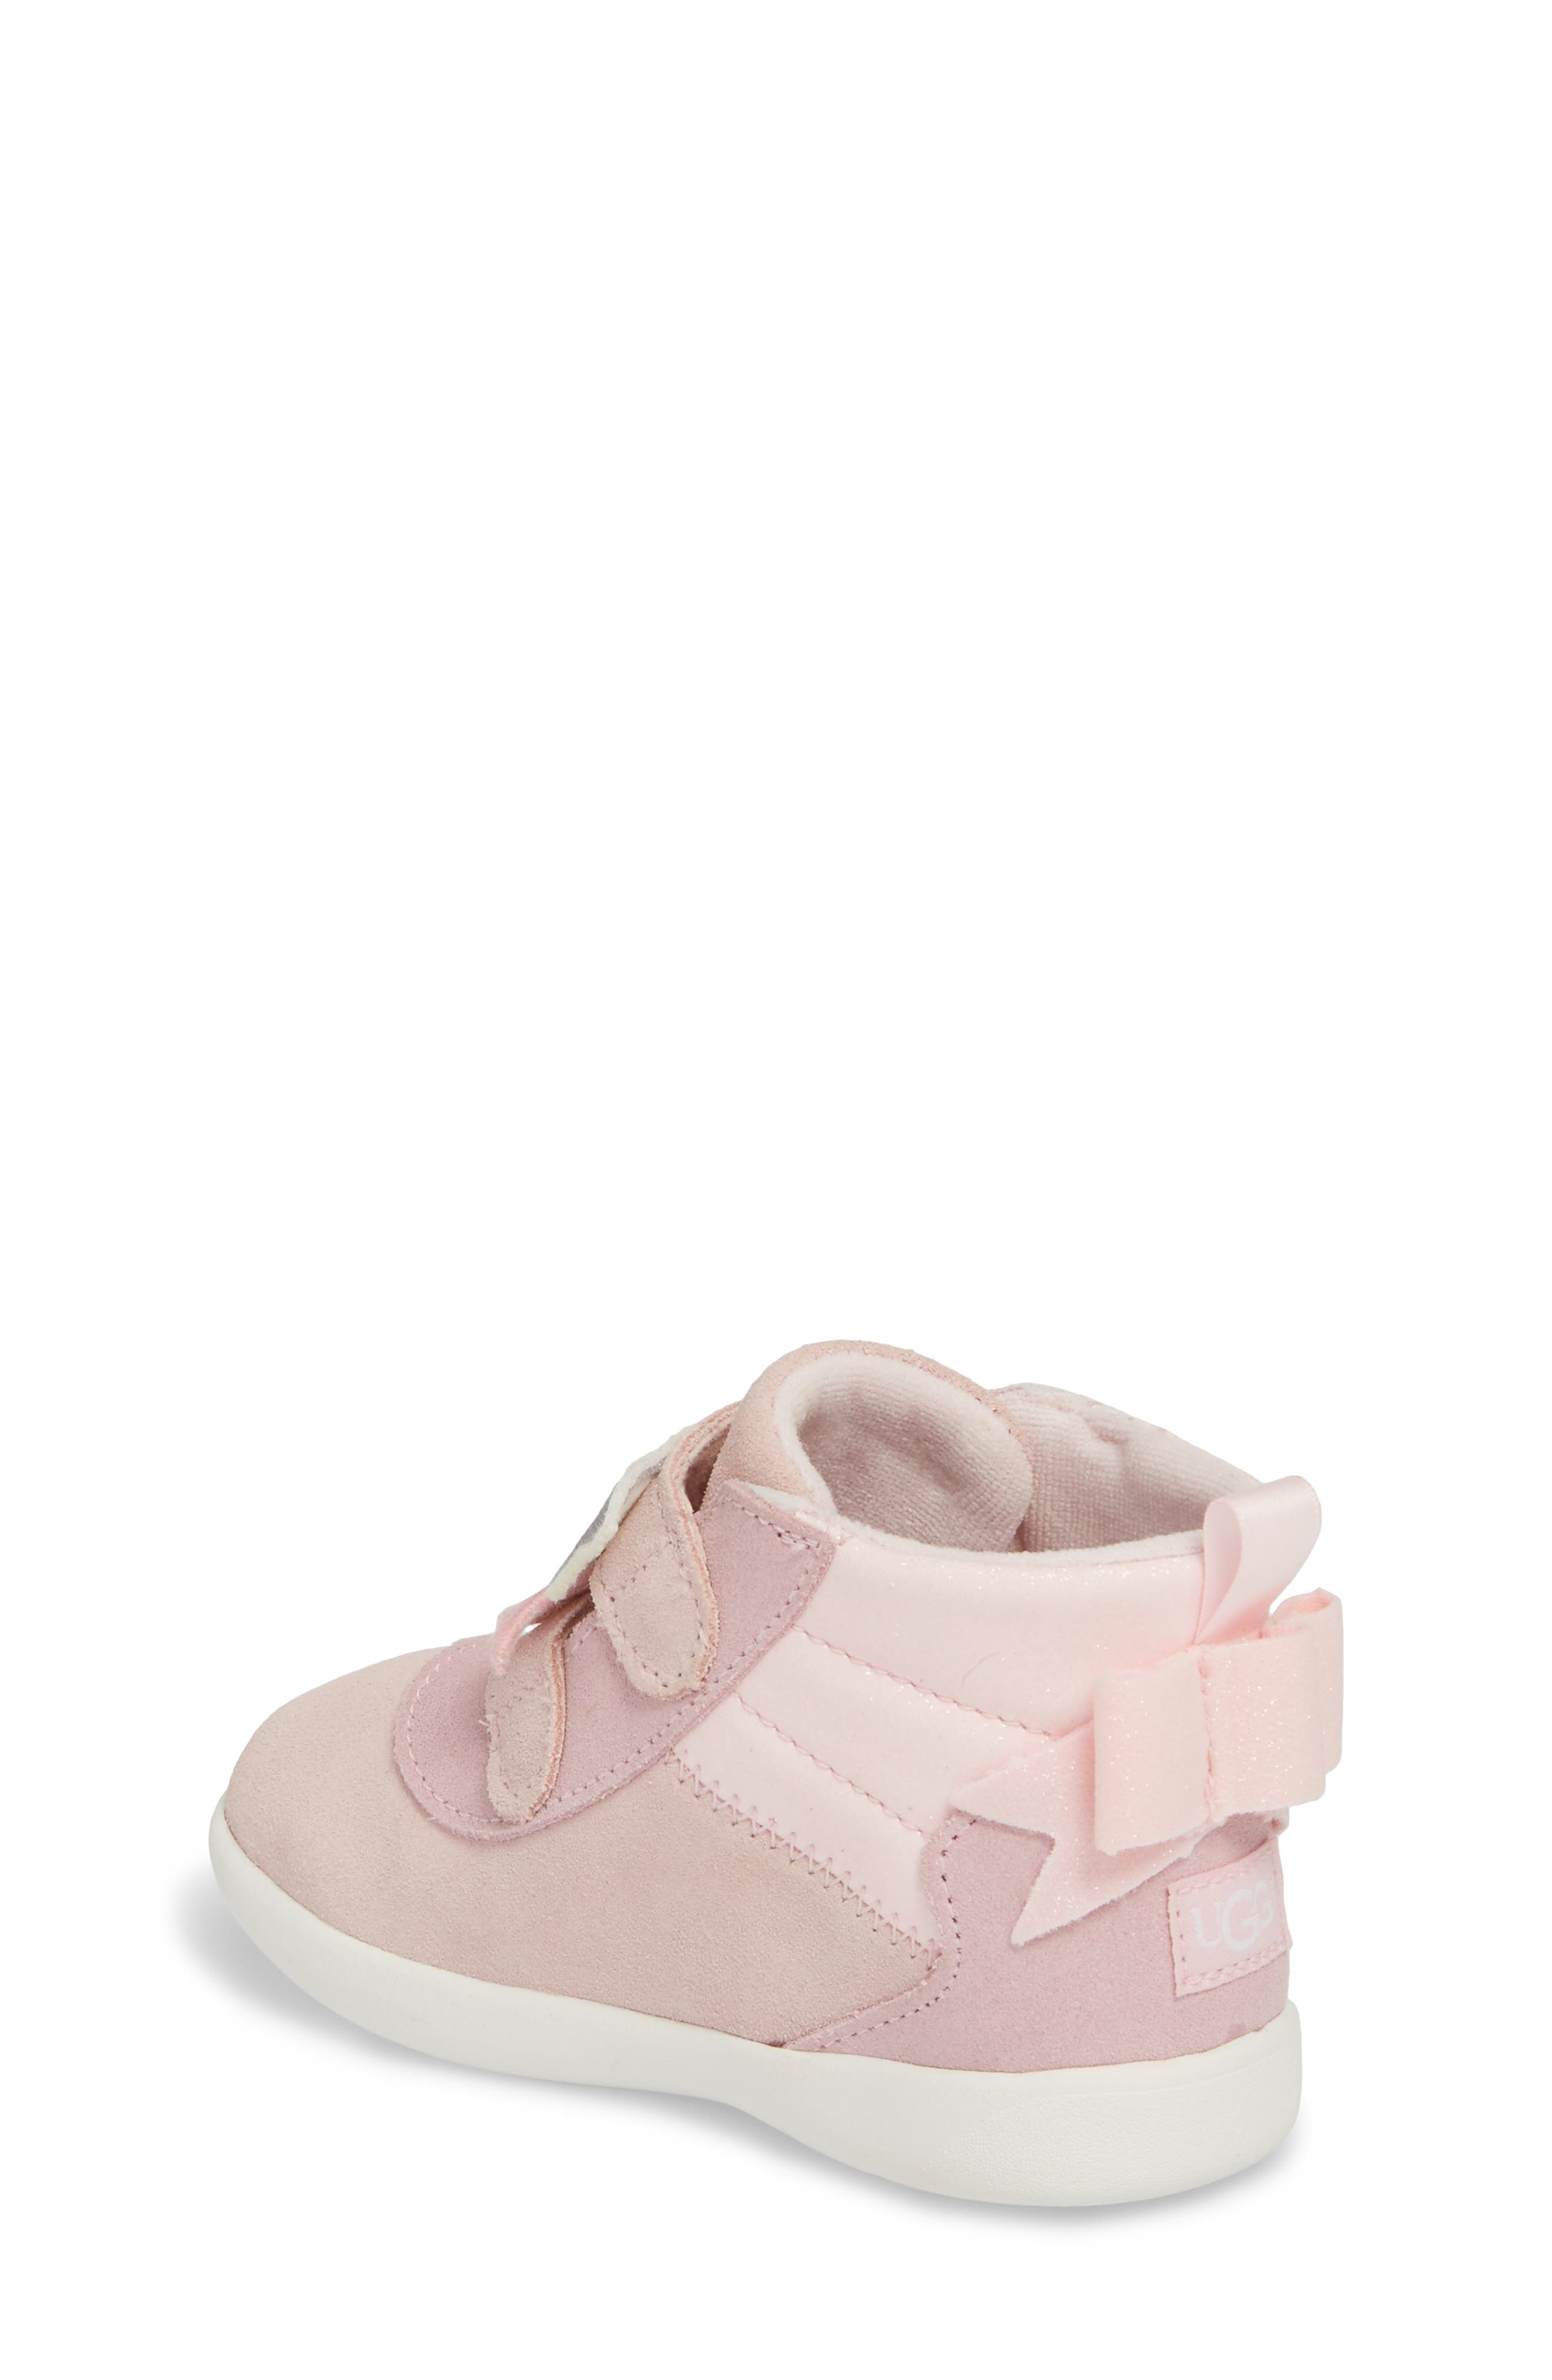 Livv Sunglass Appliqué Sneaker,                             Alternate thumbnail 2, color,                             Seashell Pink